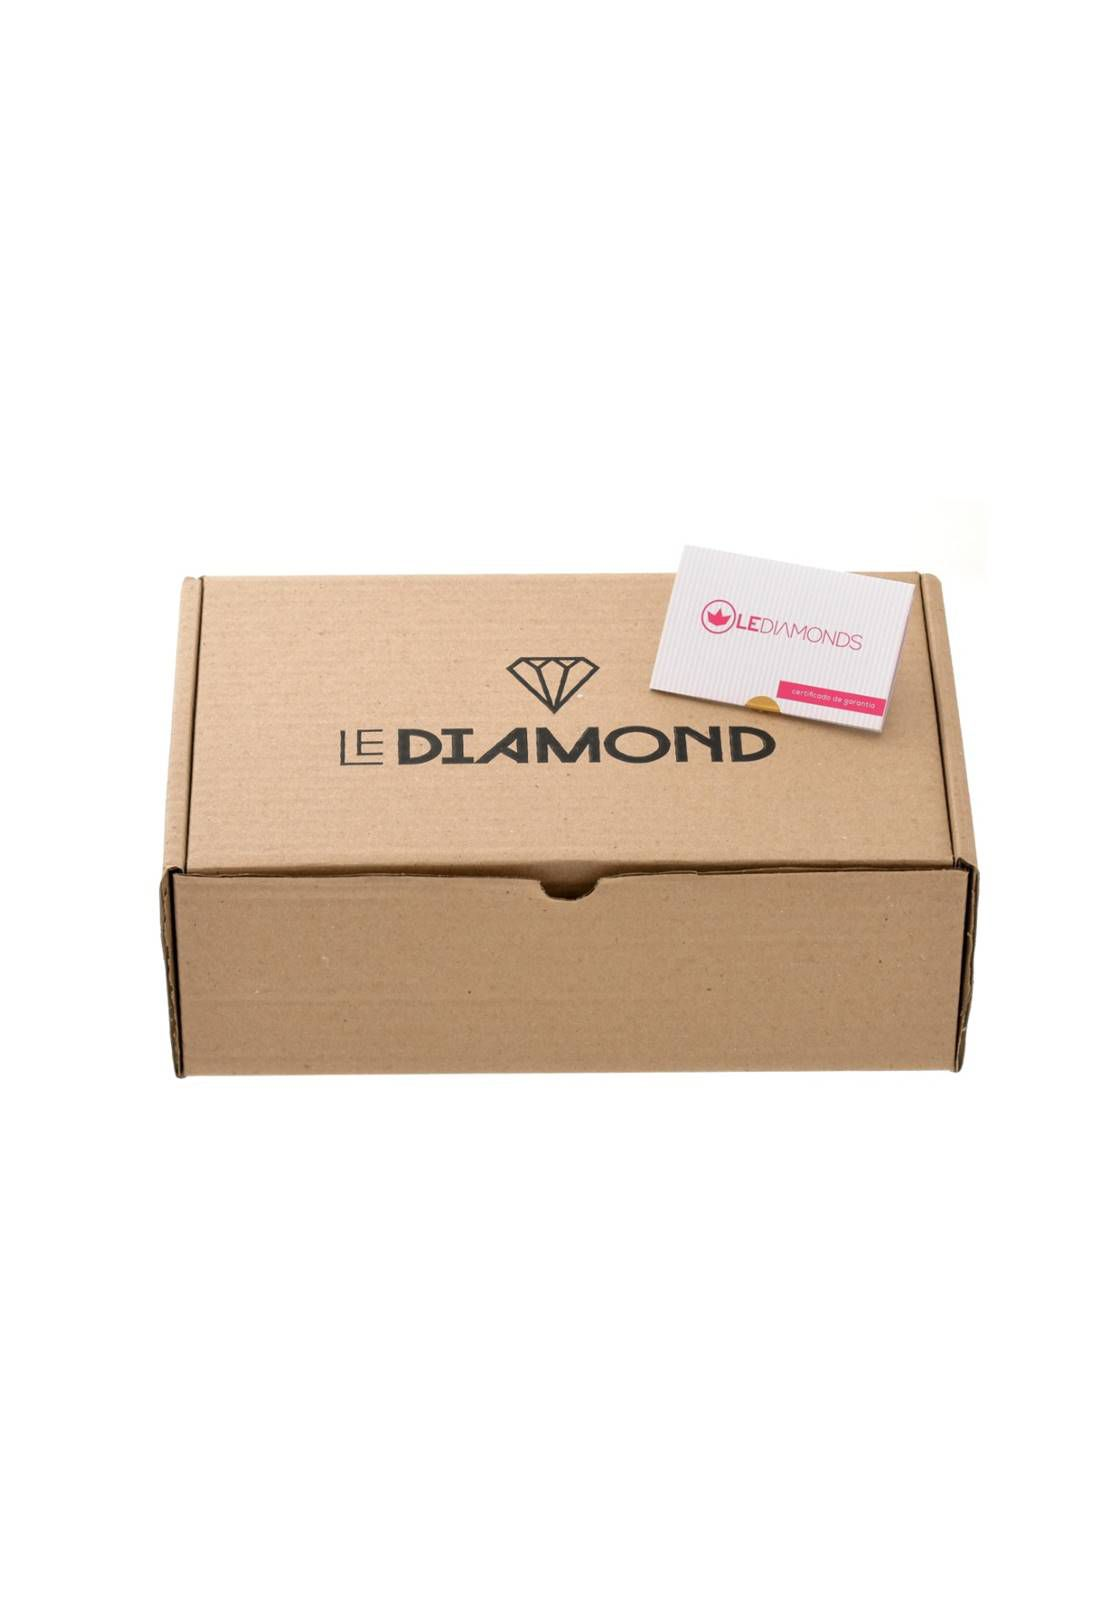 Brinco Le Diamond Acrílico Base Folheada e Abelhas